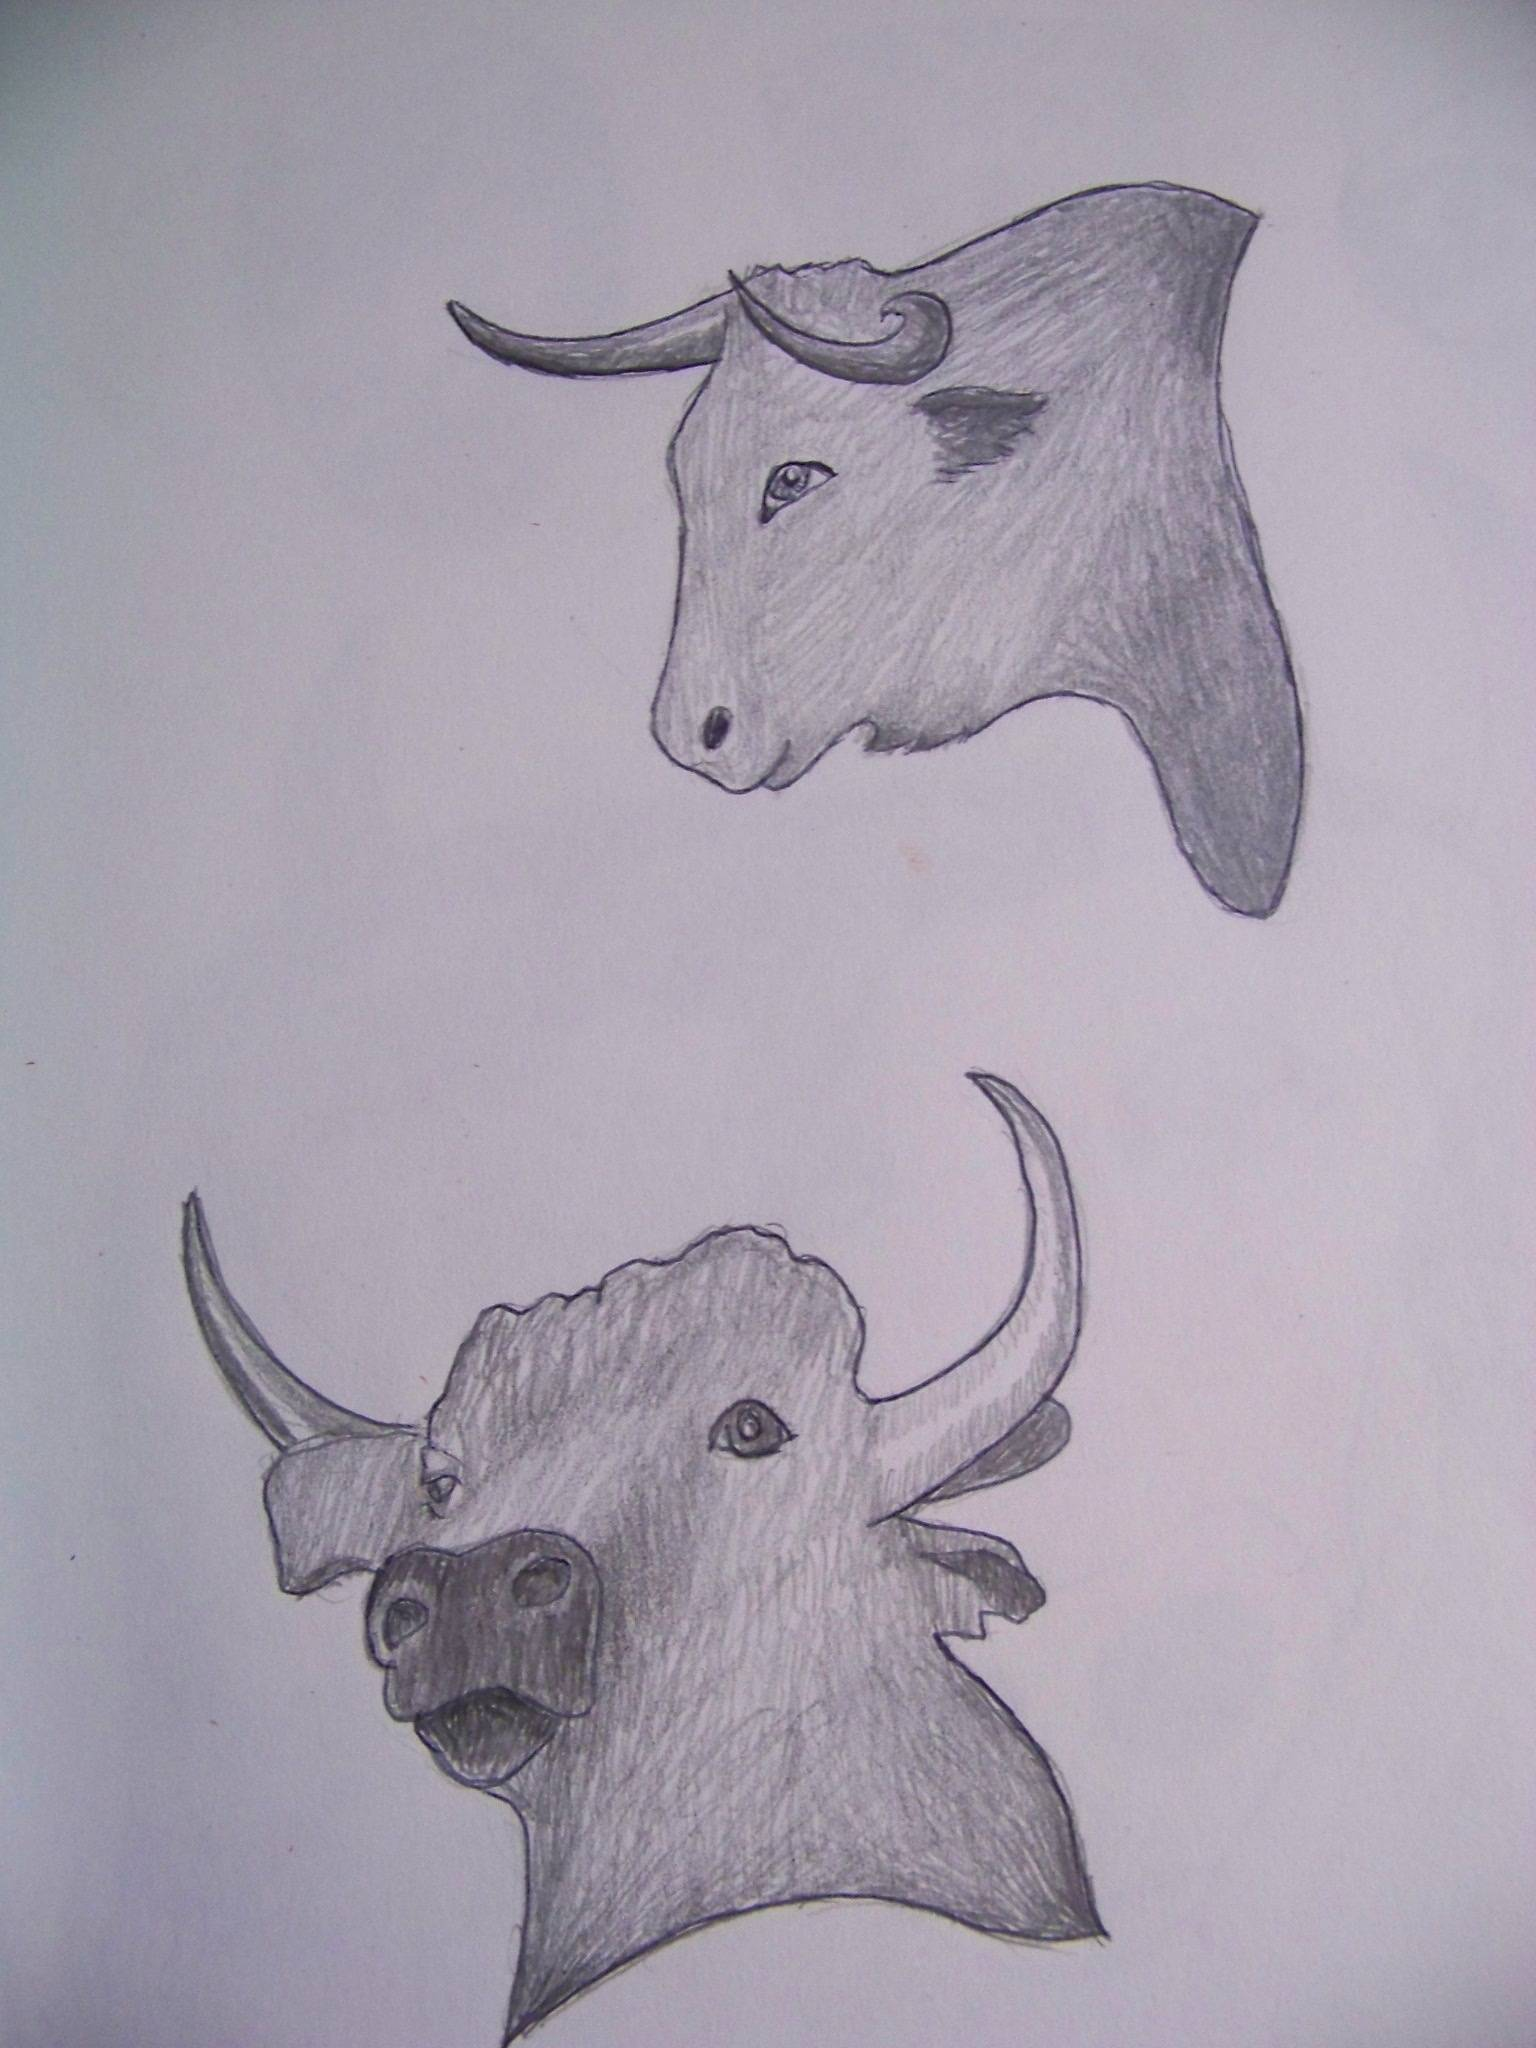 Bull's eye thumbnail sketches